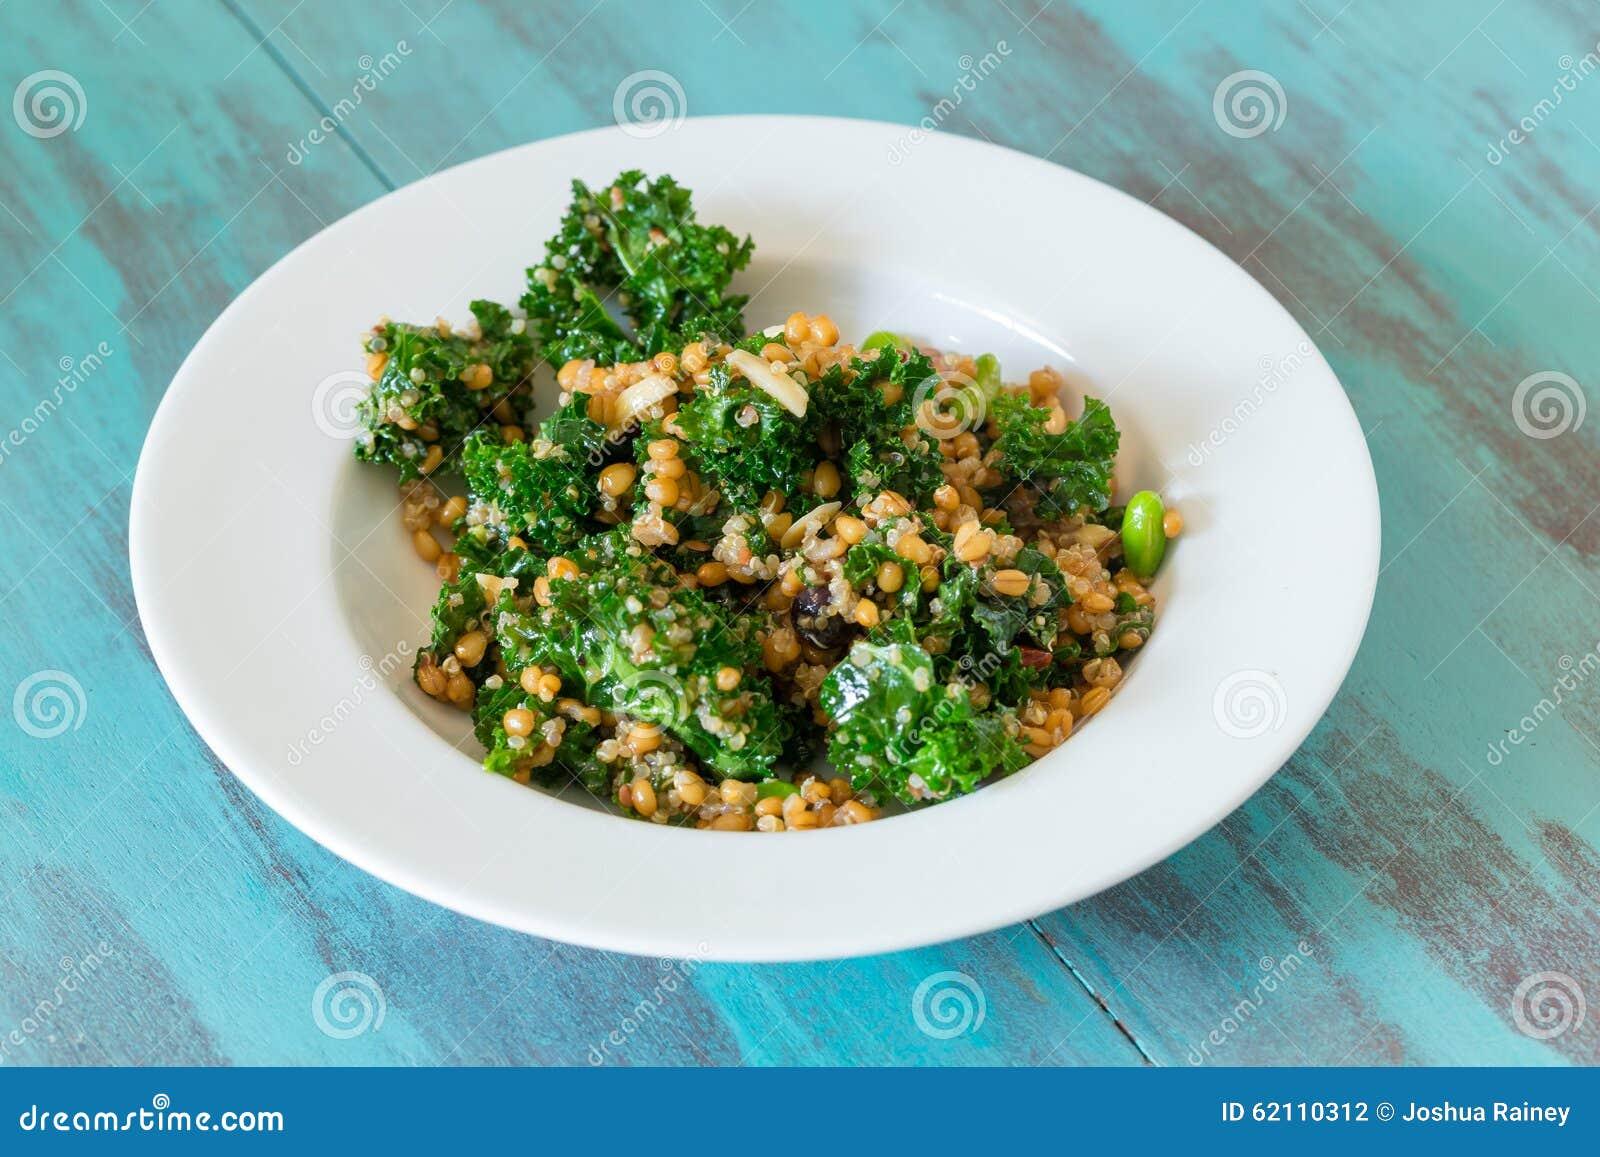 Raw Paleo Kale and Quinoa Superfood Salad